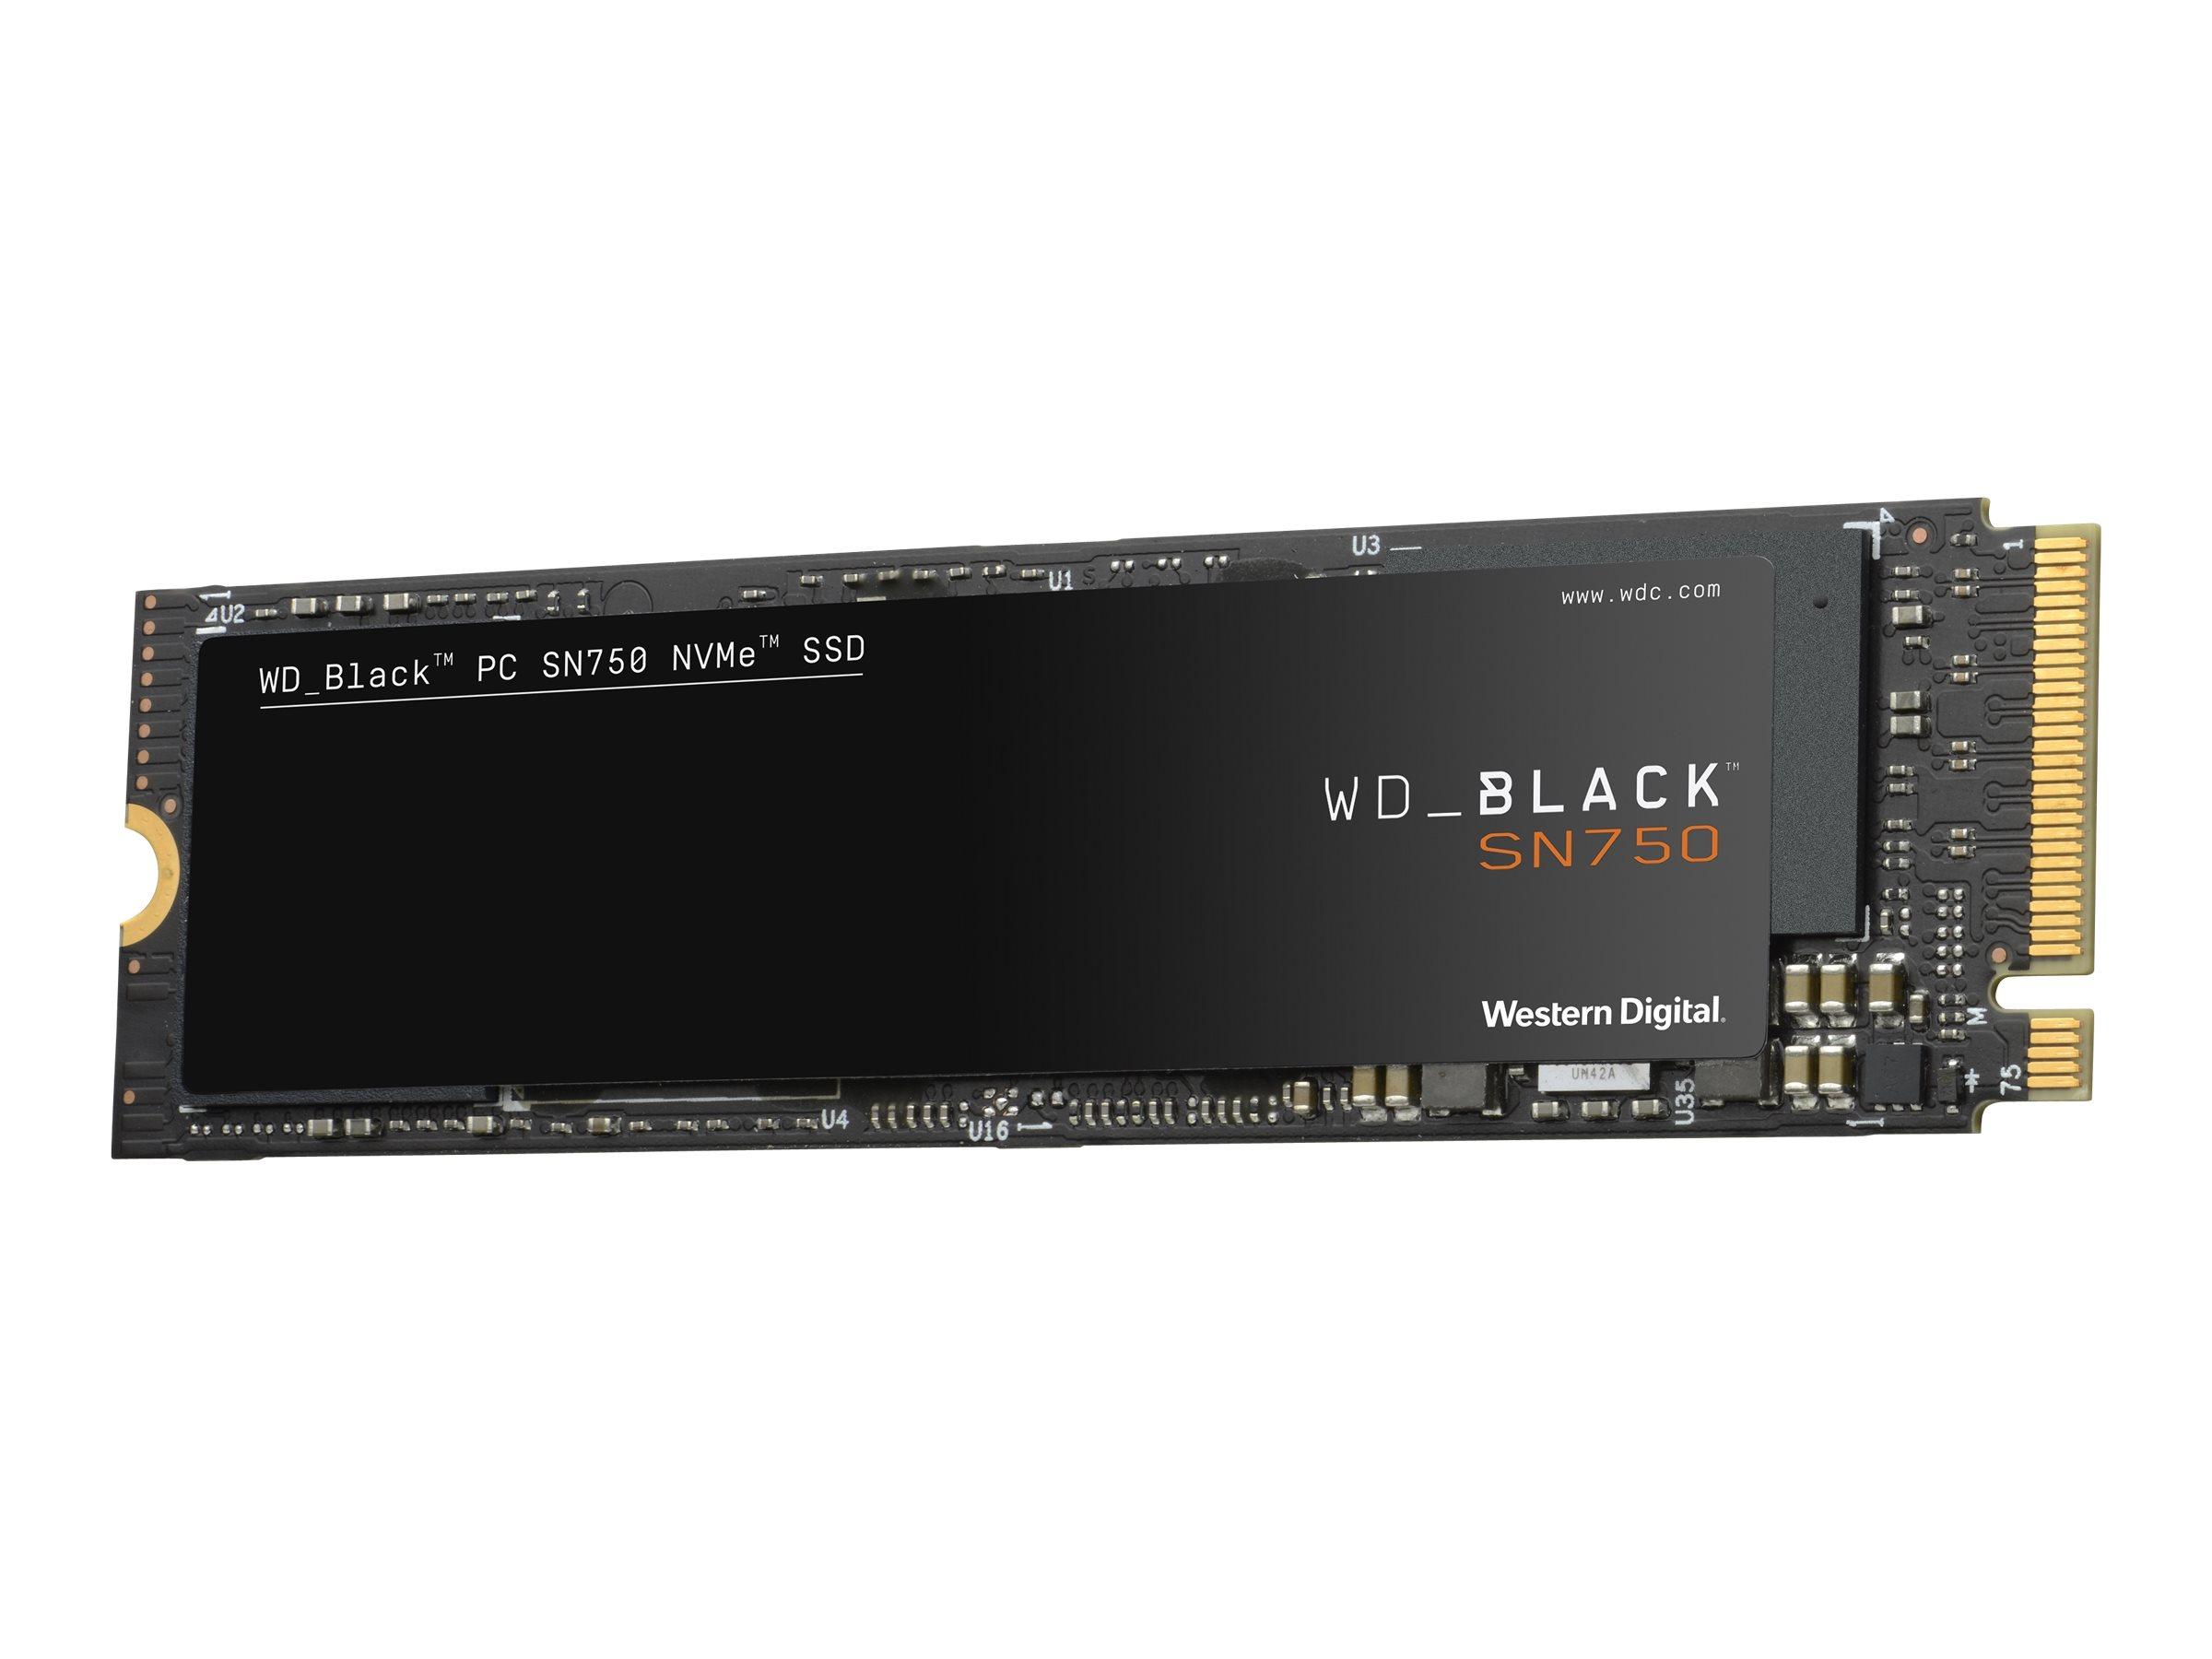 WD Black SN750 NVMe SSD WDS250G3X0C - Solid-State-Disk - 250 GB - intern - M.2 2280 - PCI Express 3.0 x4 (NVMe)